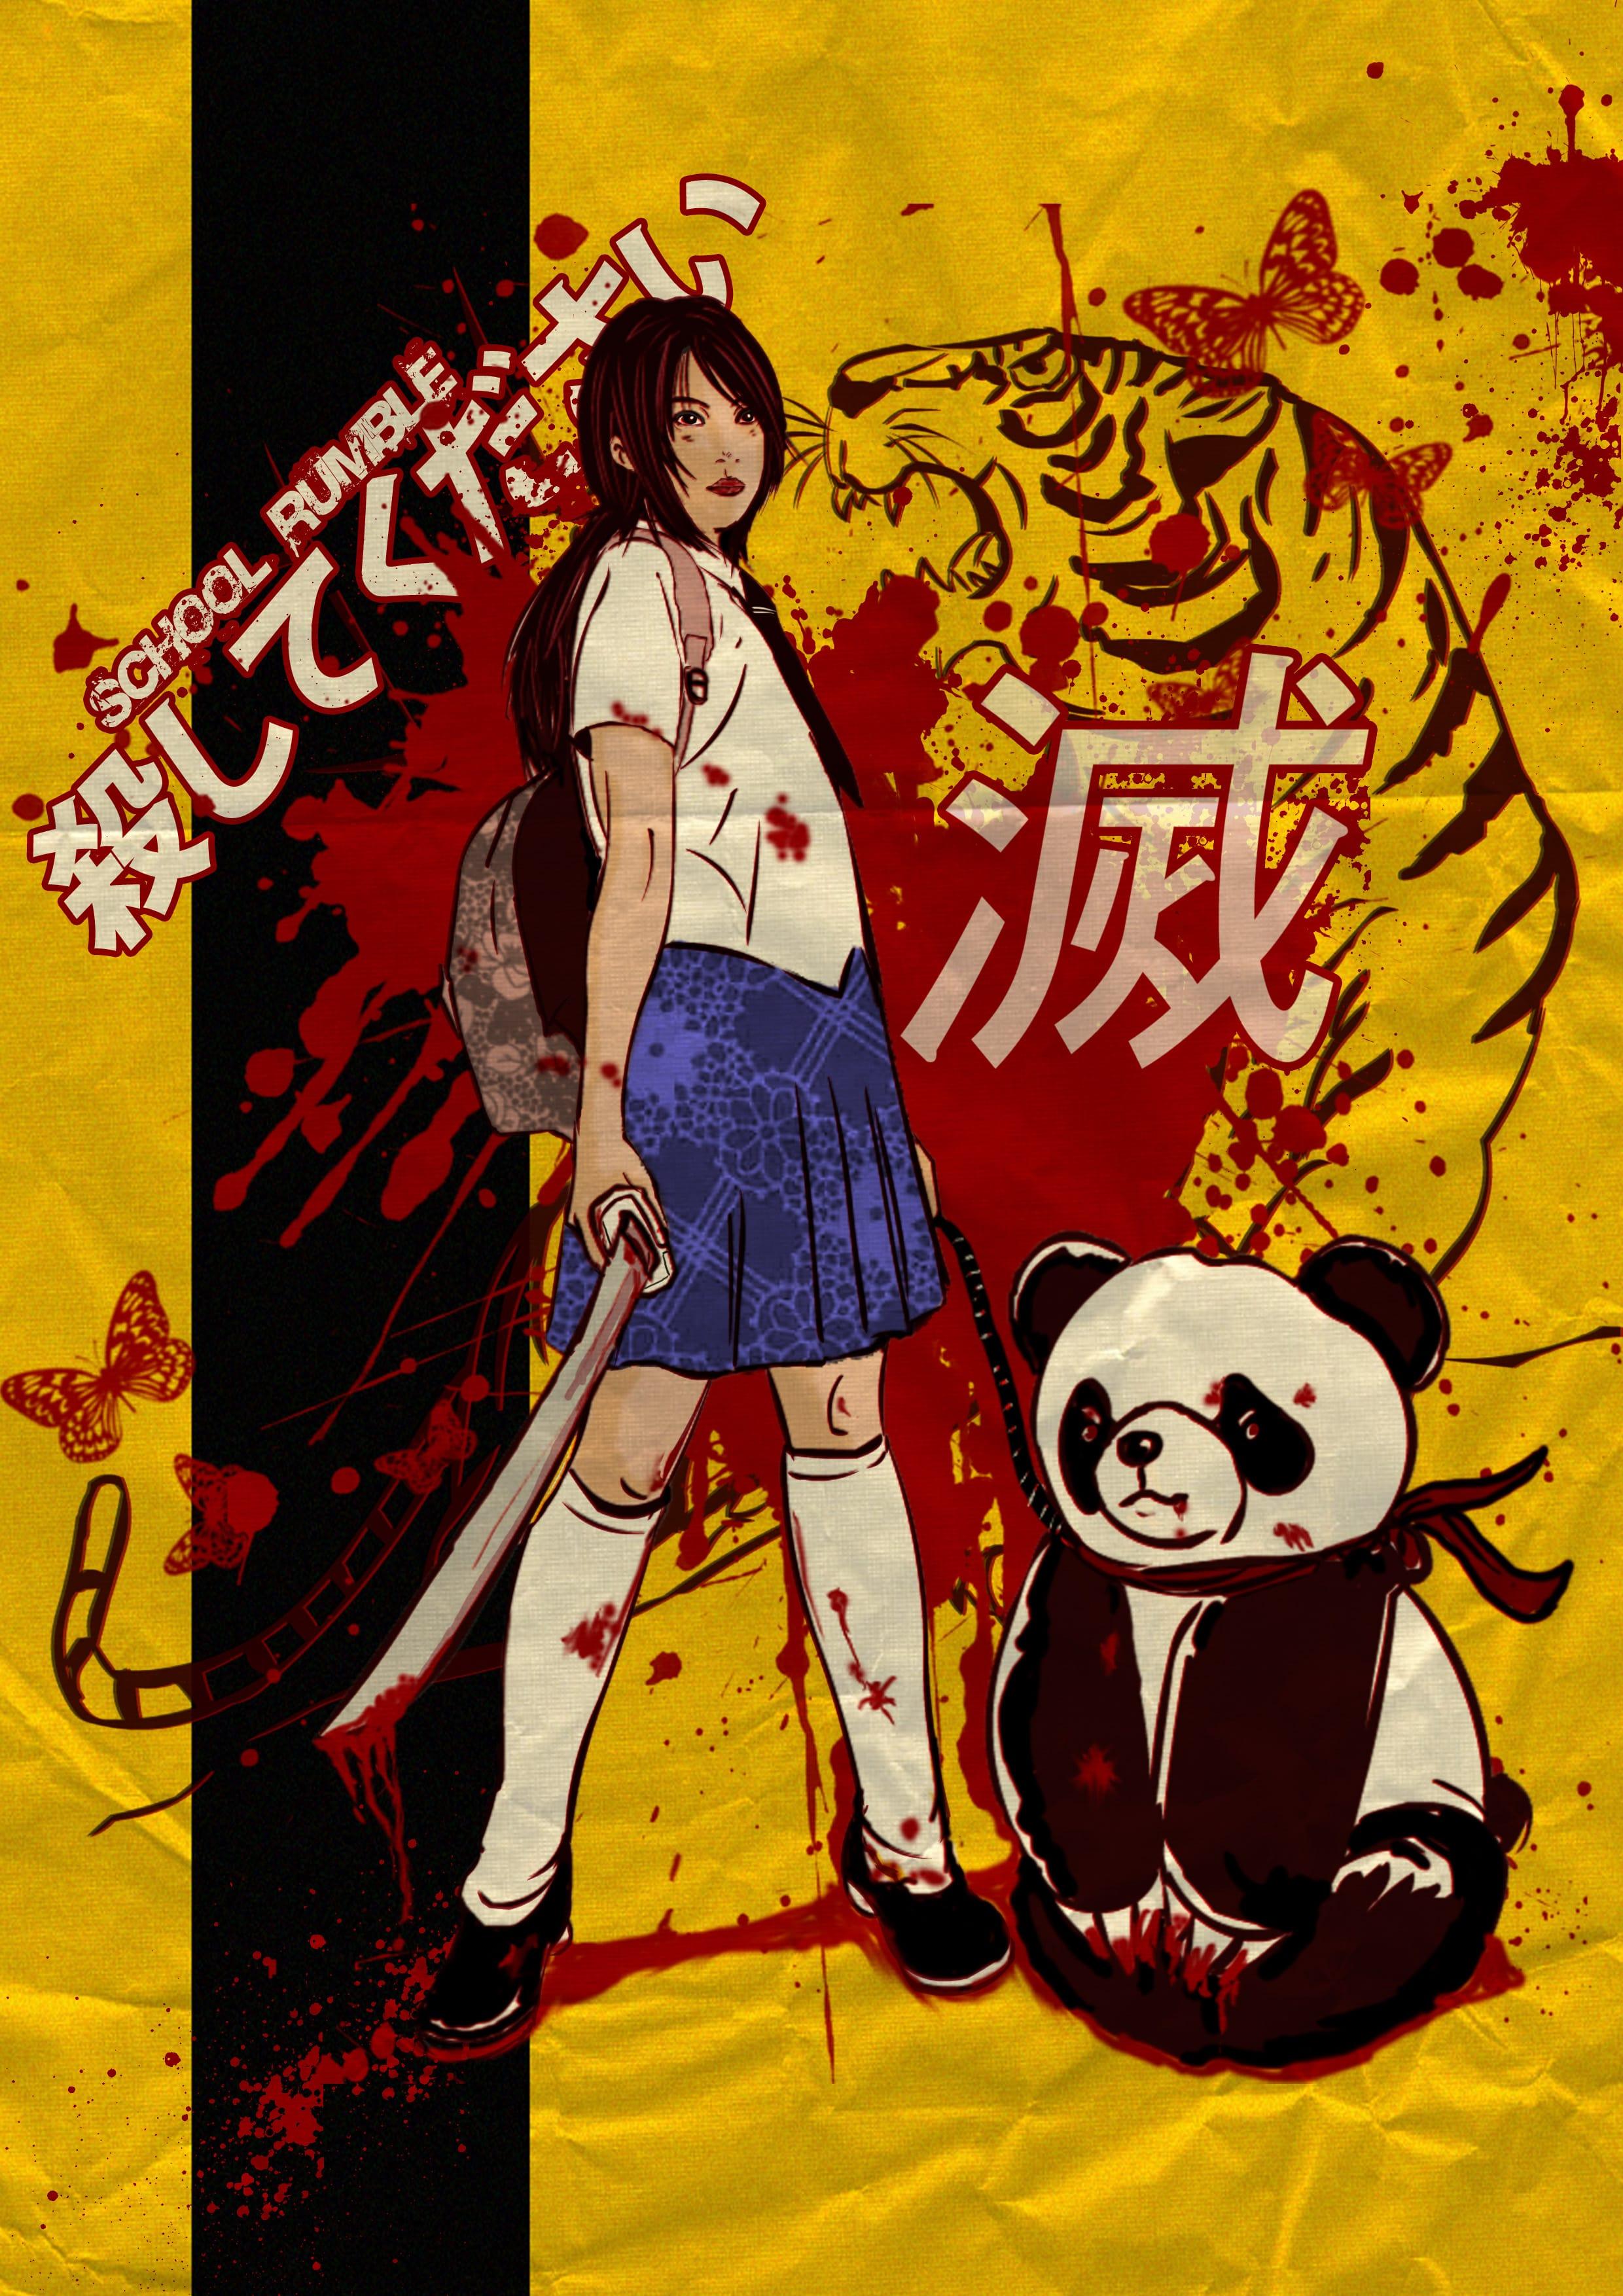 battle royale yuki u-min